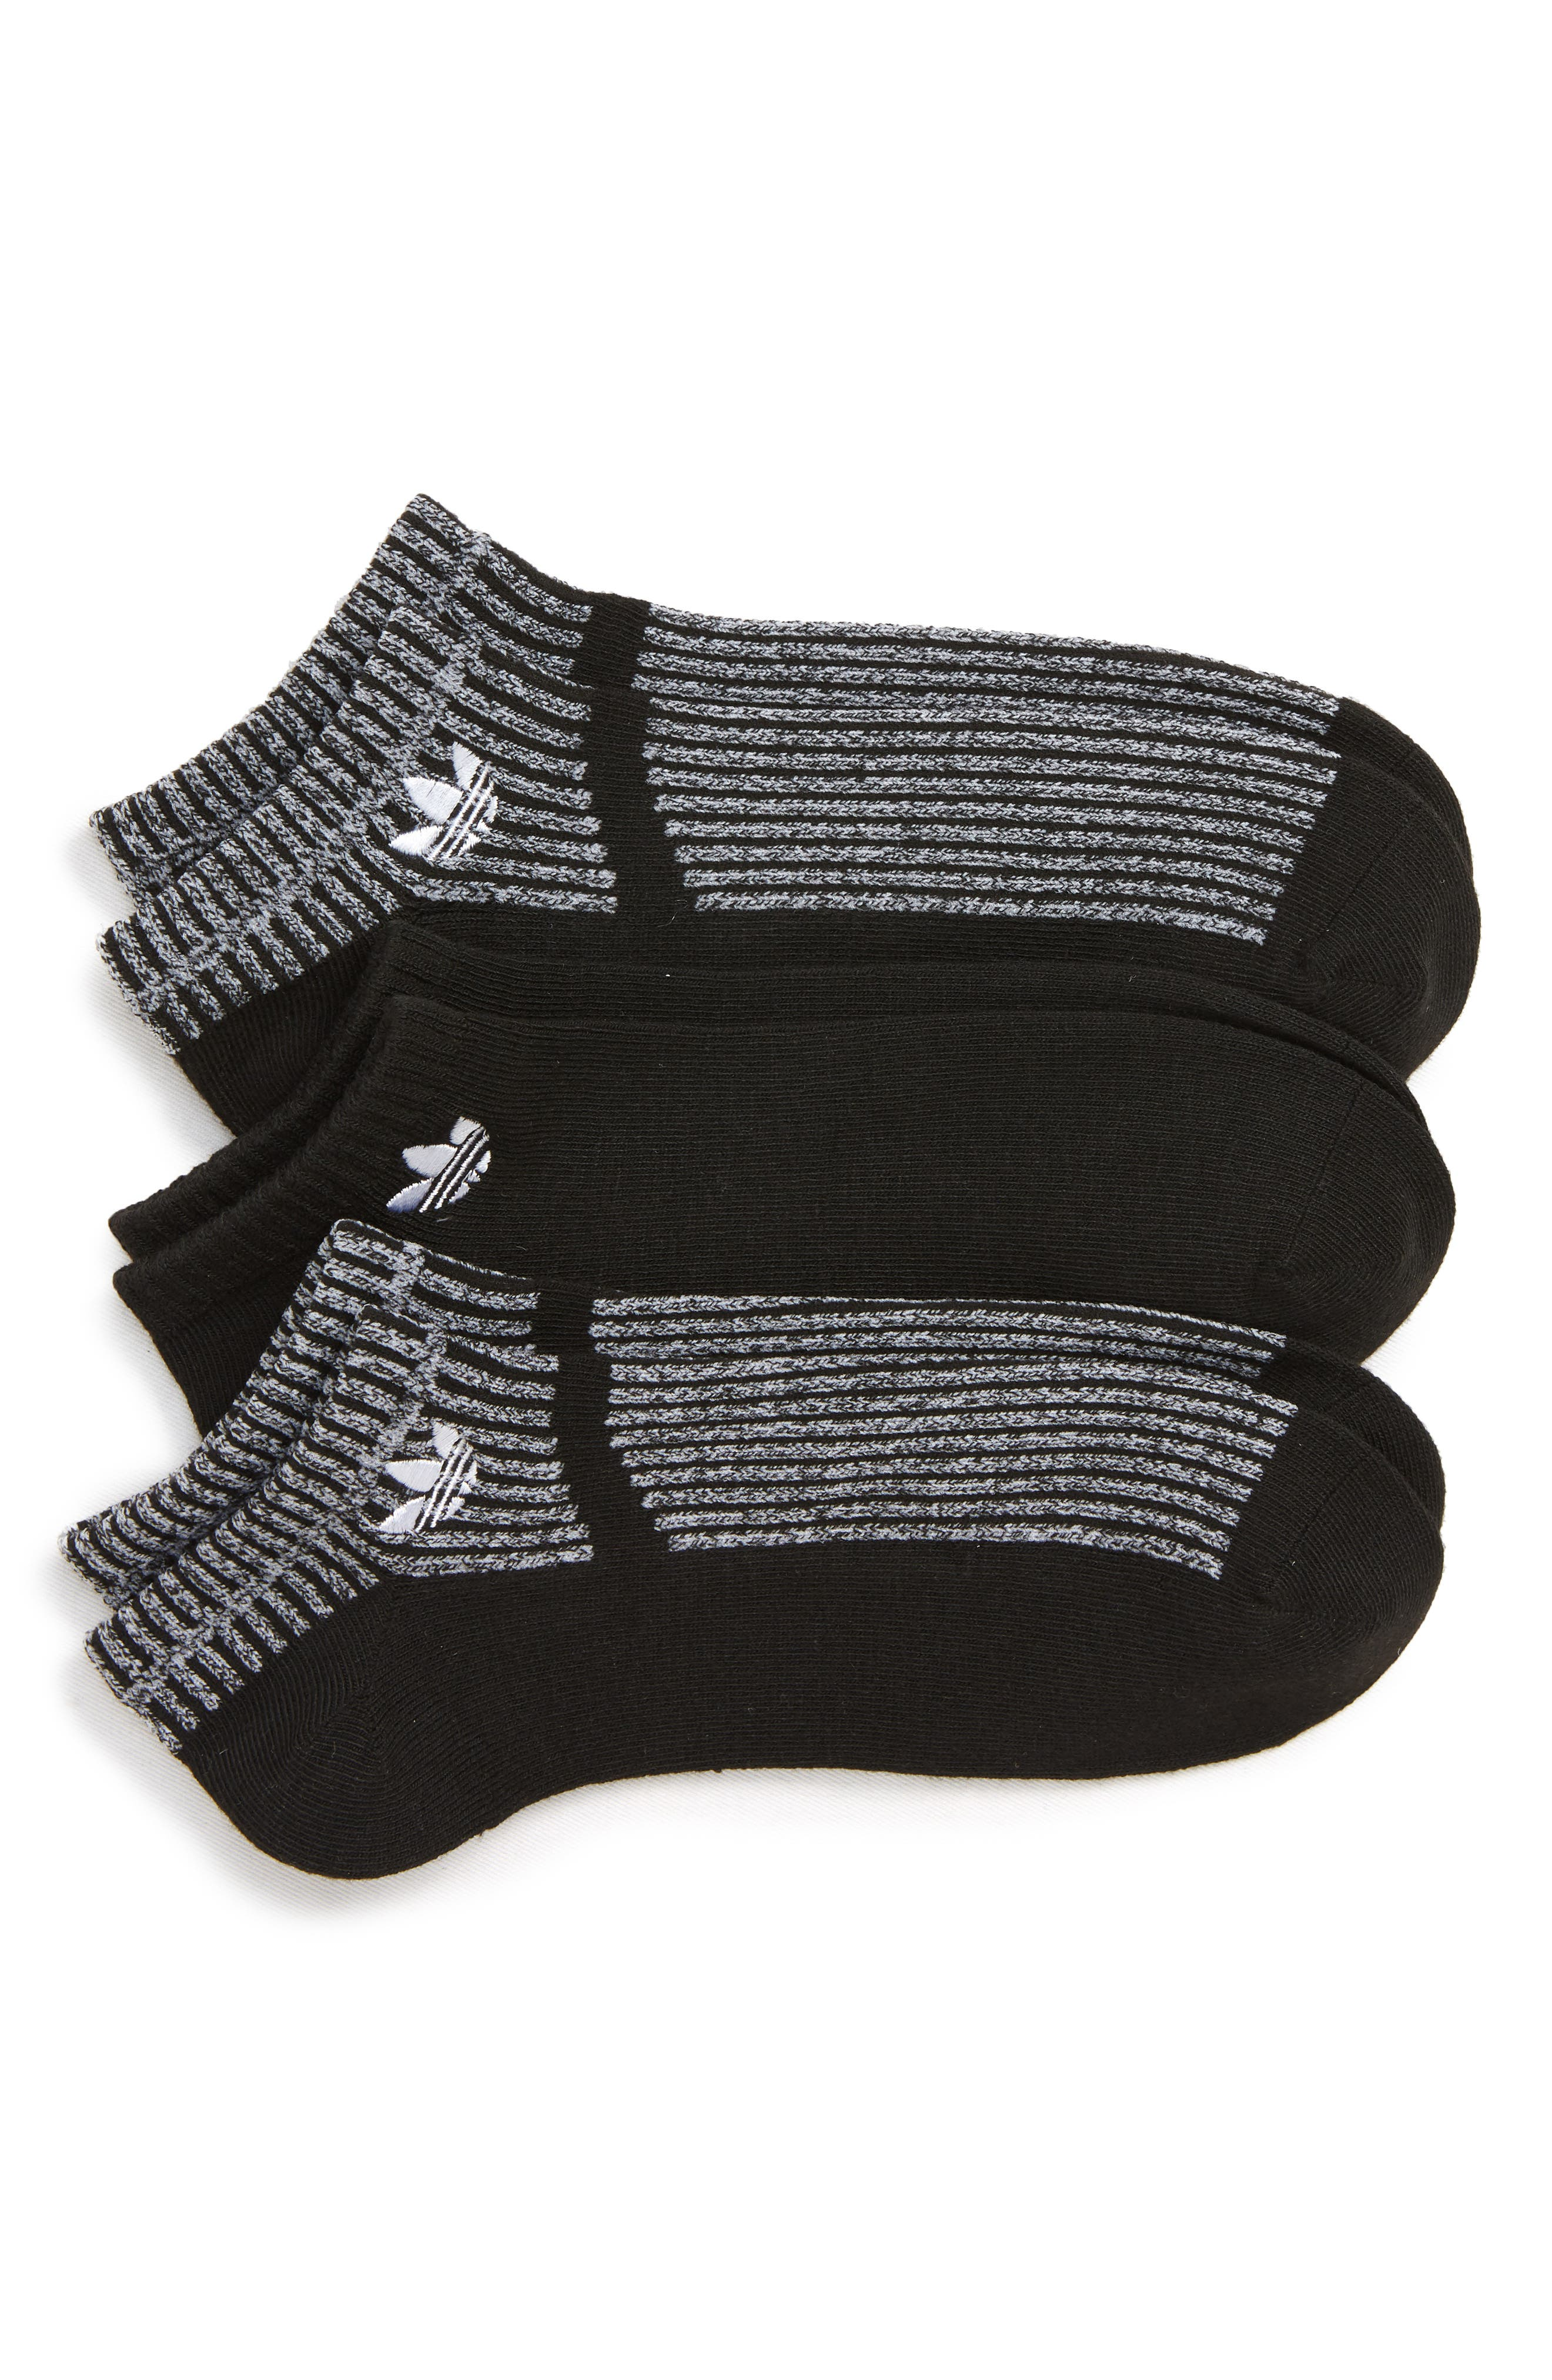 adidas Original Prime Mesh III 3-Pack Socks,                             Main thumbnail 1, color,                             BLACK/ WHITE MARL